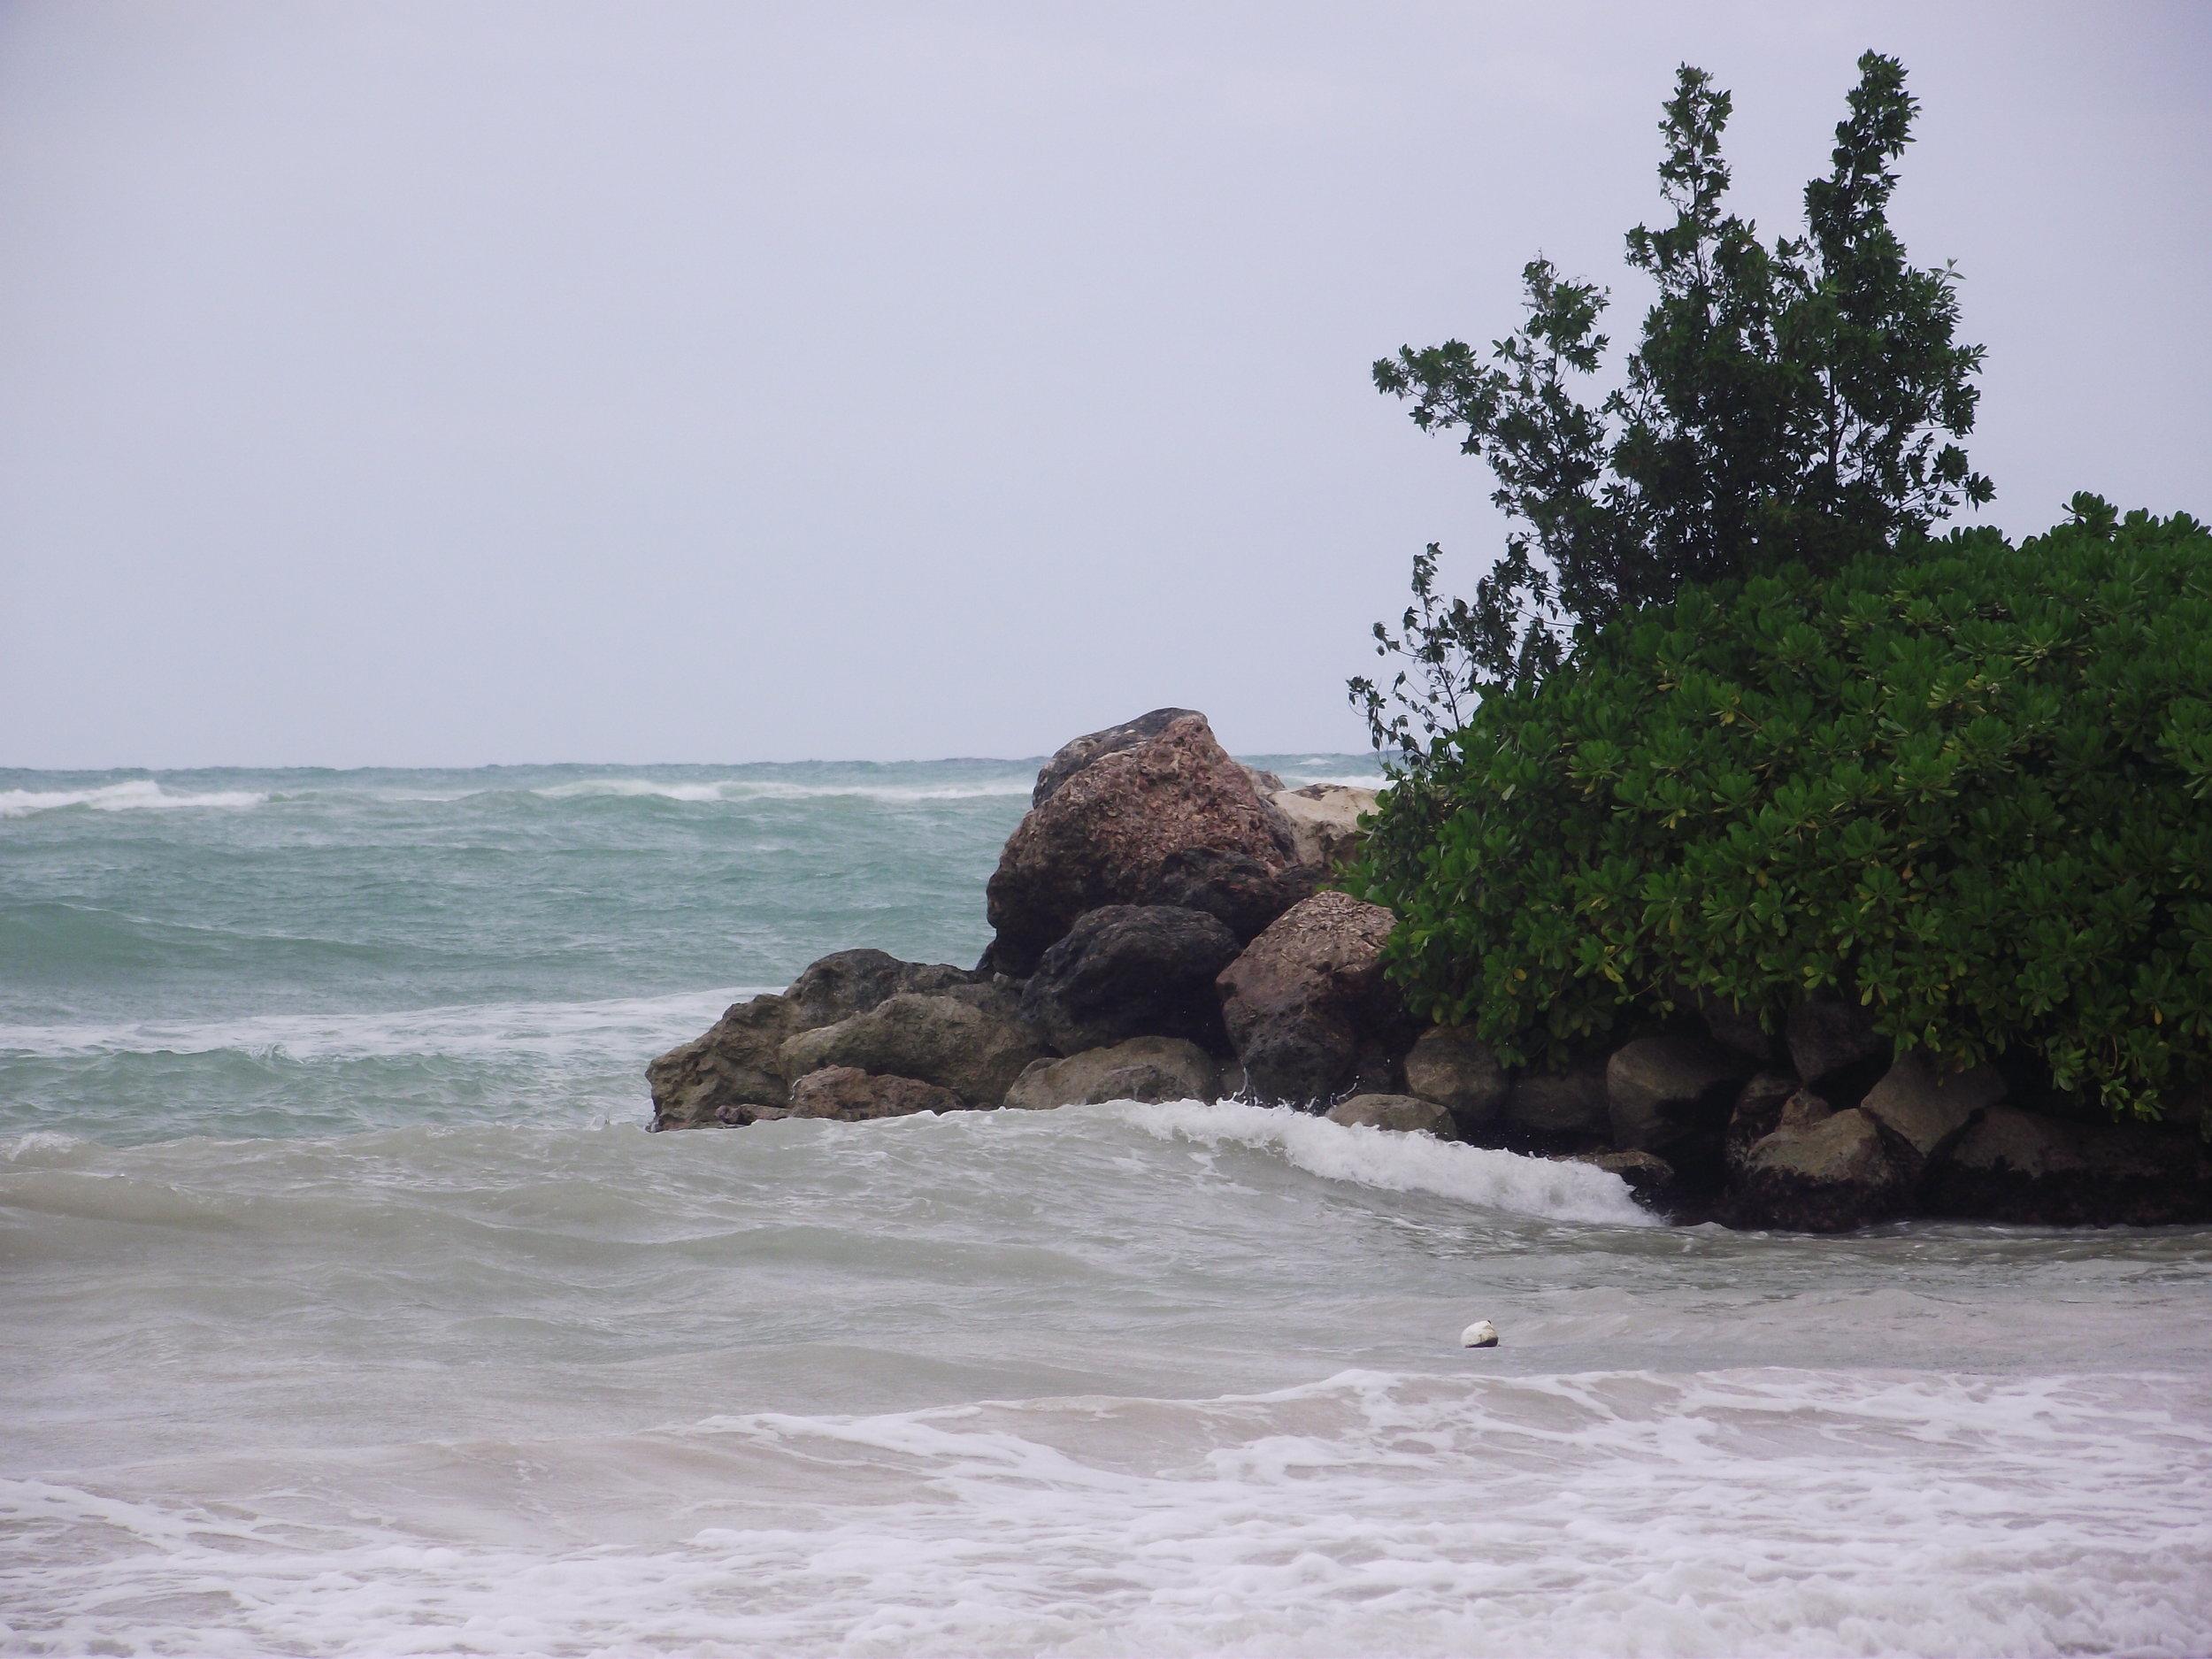 Kimberly C. Lyons_KCL-IDESIGN, LLC_Jamaica 2010 (226).JPG